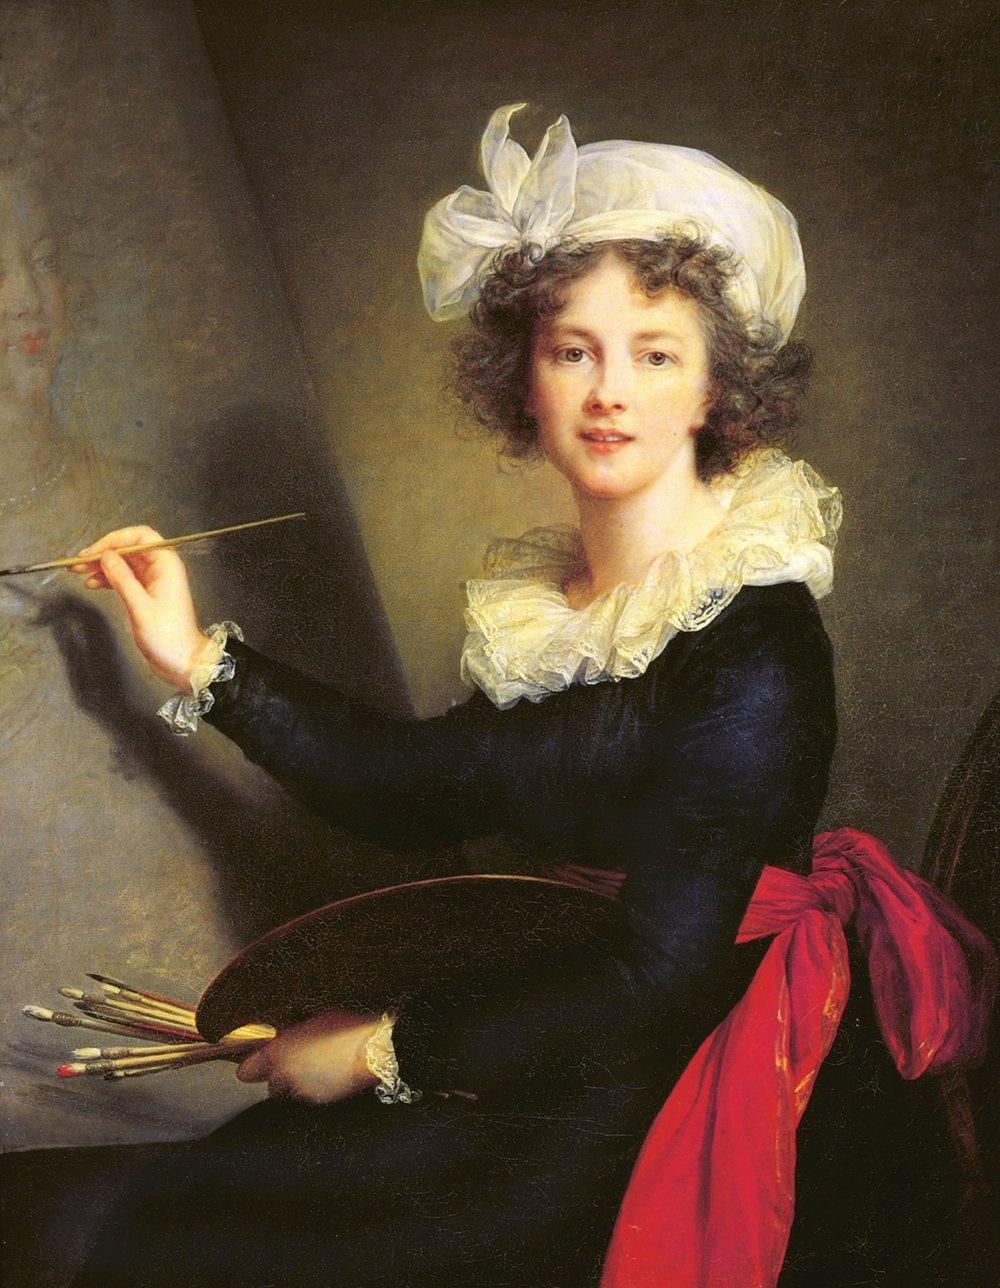 Elisabeth Vigée Lebrun, Self-Portrait, 1790, oil on canvas, Uffizi Gallery